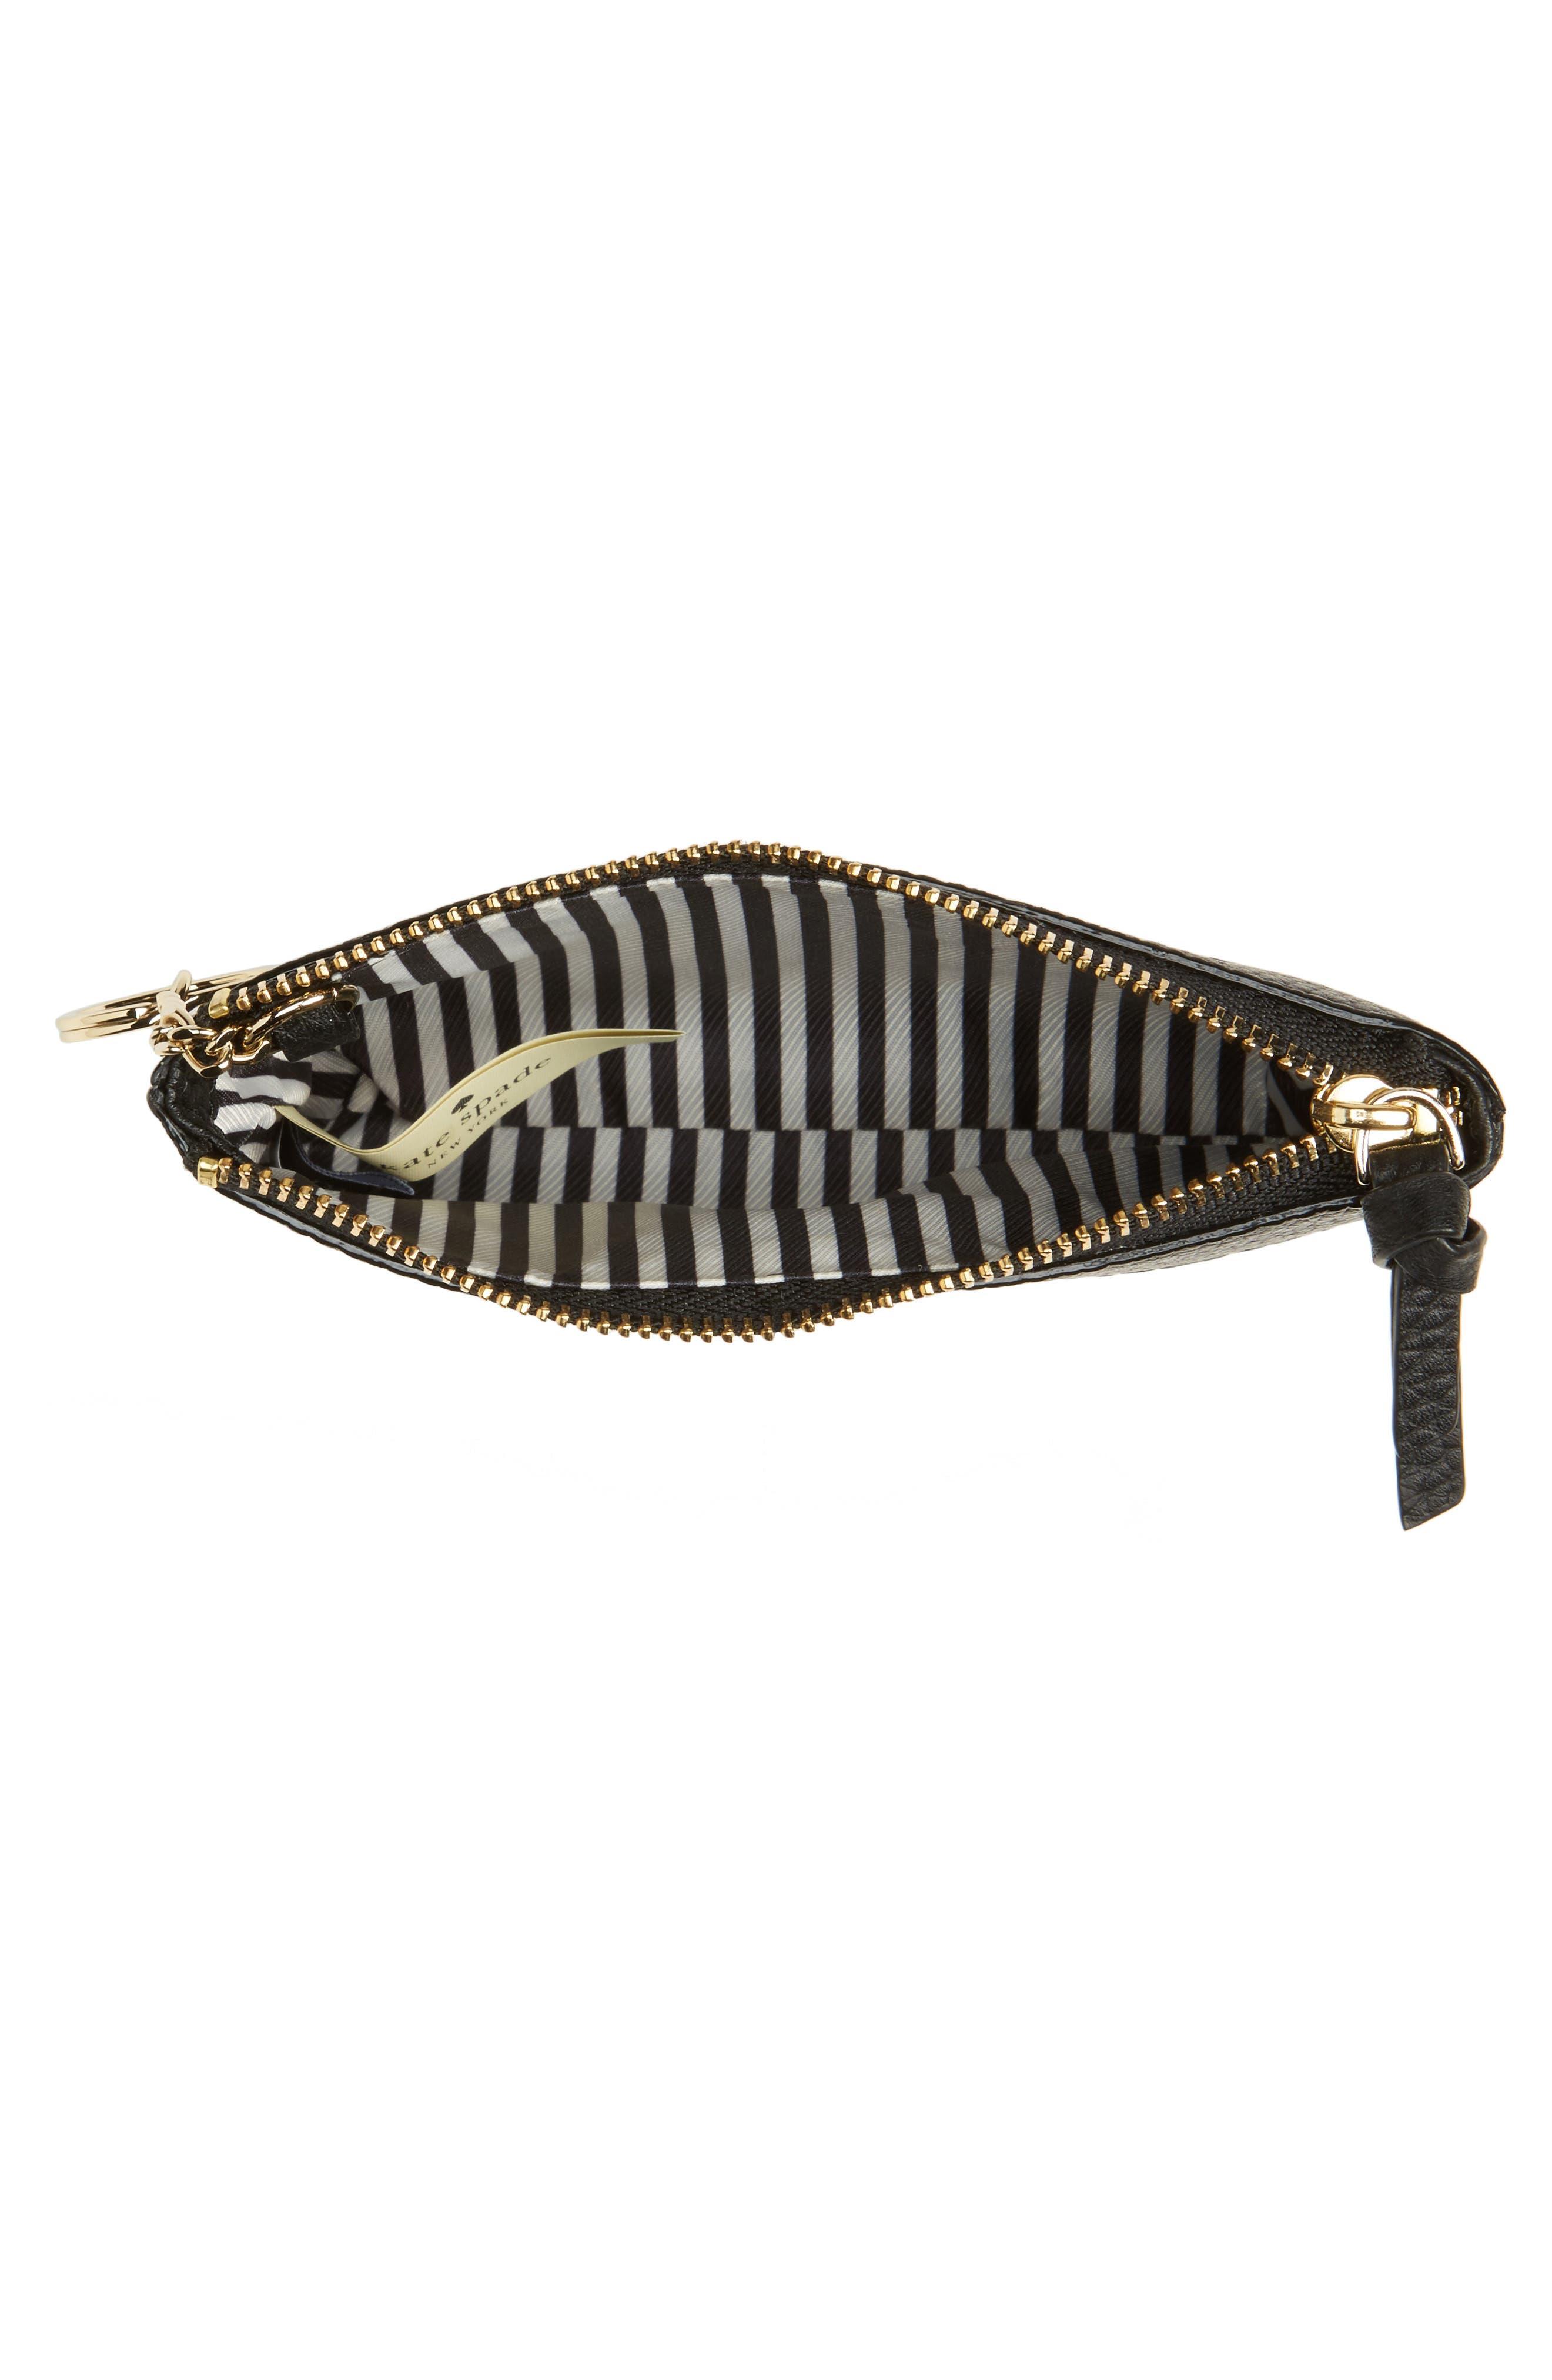 jackson street mila leather zip pouch,                             Alternate thumbnail 2, color,                             001